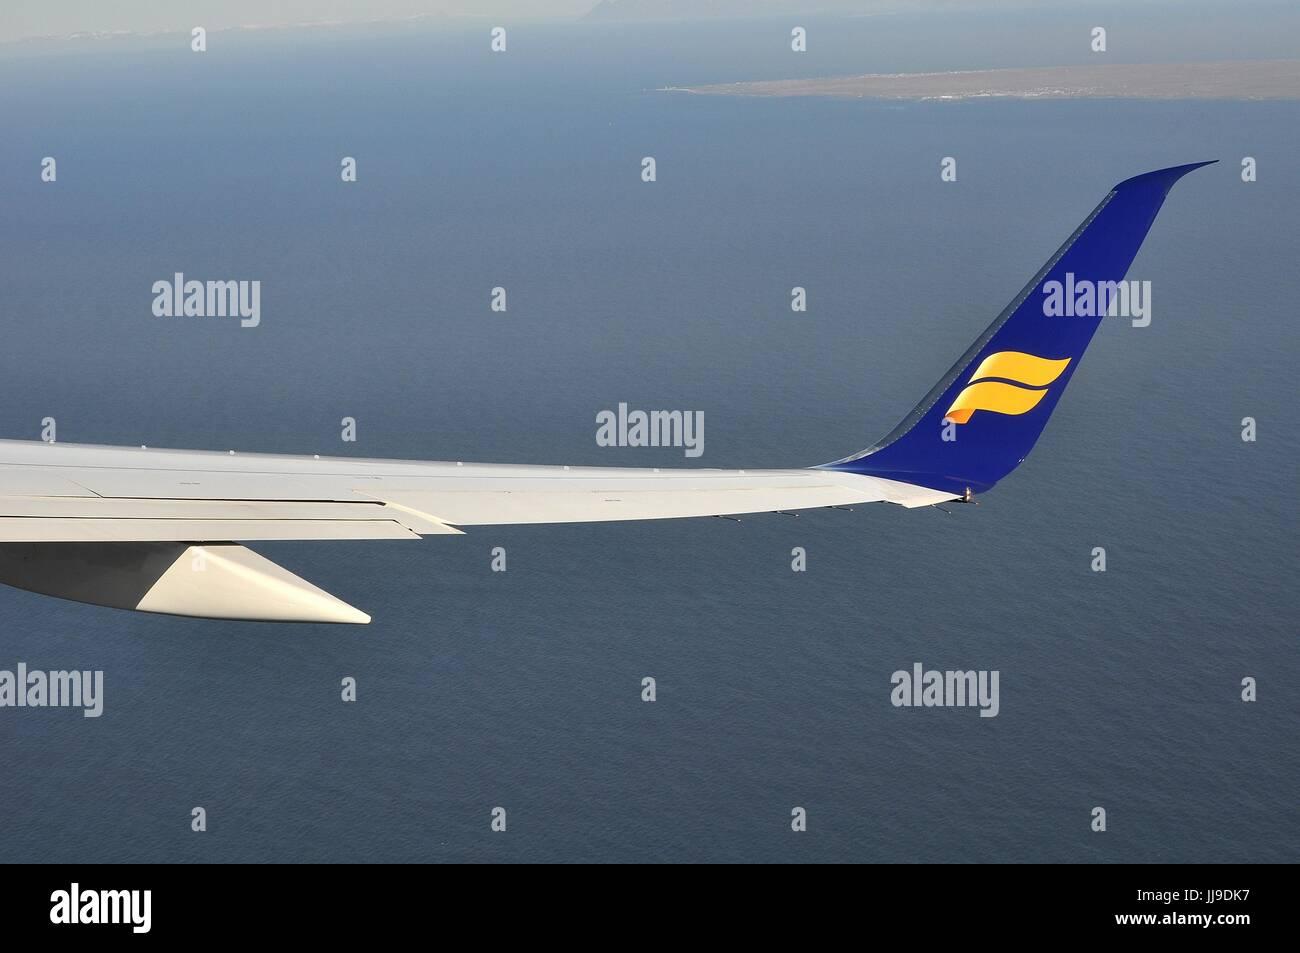 NEW WINGLET ON ICELANDAIR BOEING 757-200 - Stock Image